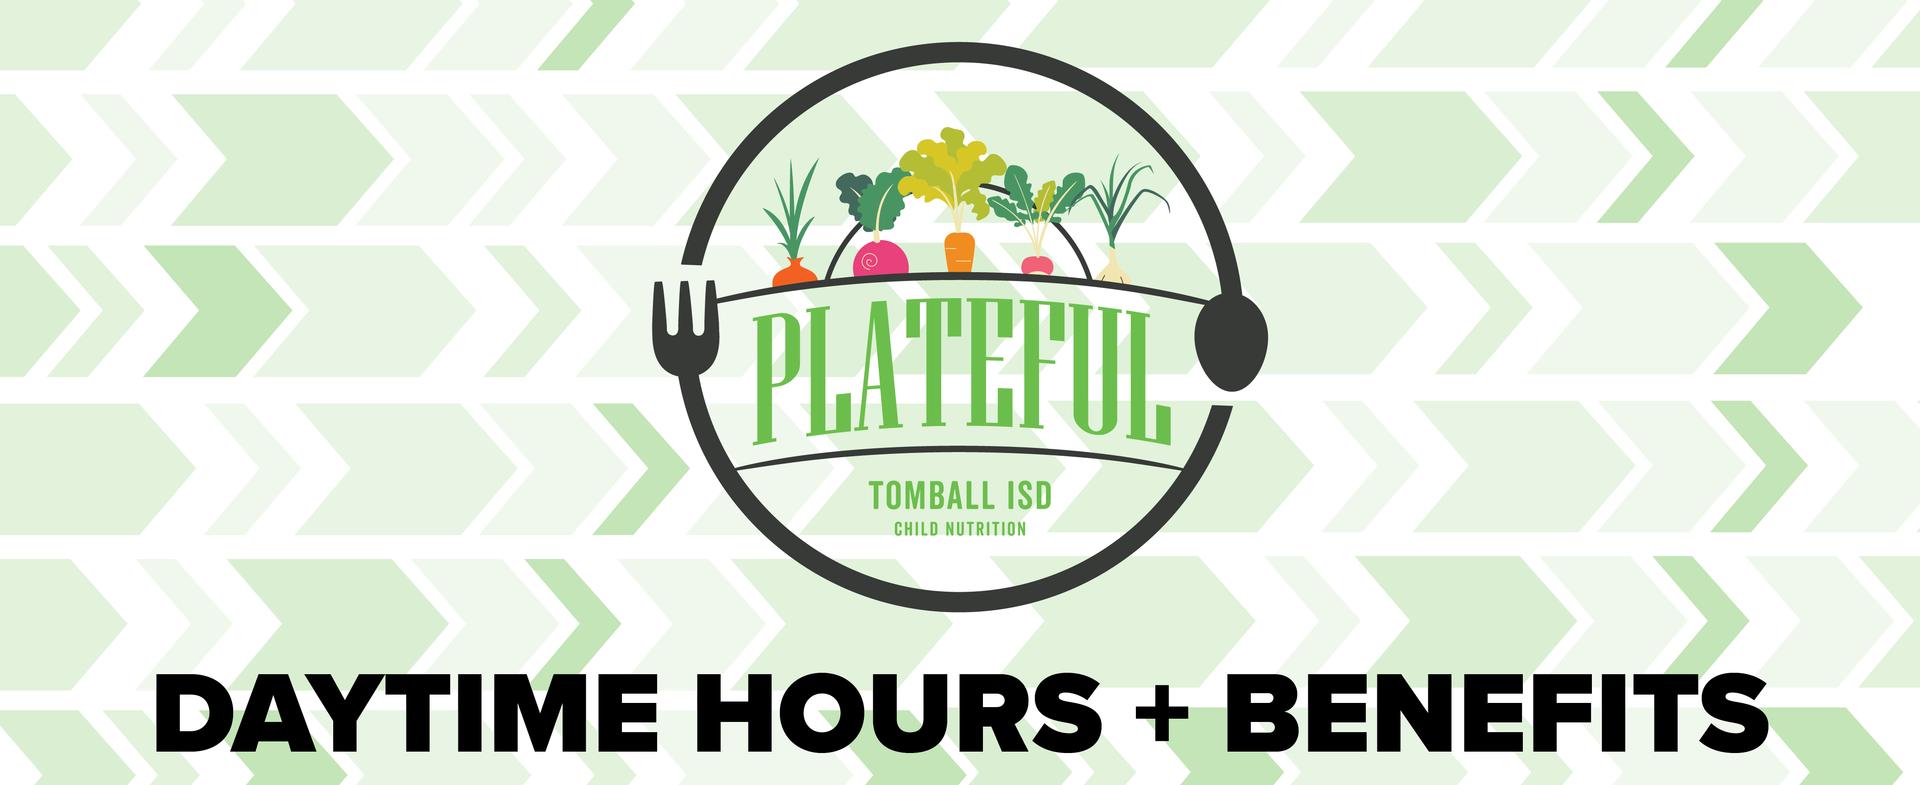 Daytime Hours + Benefits